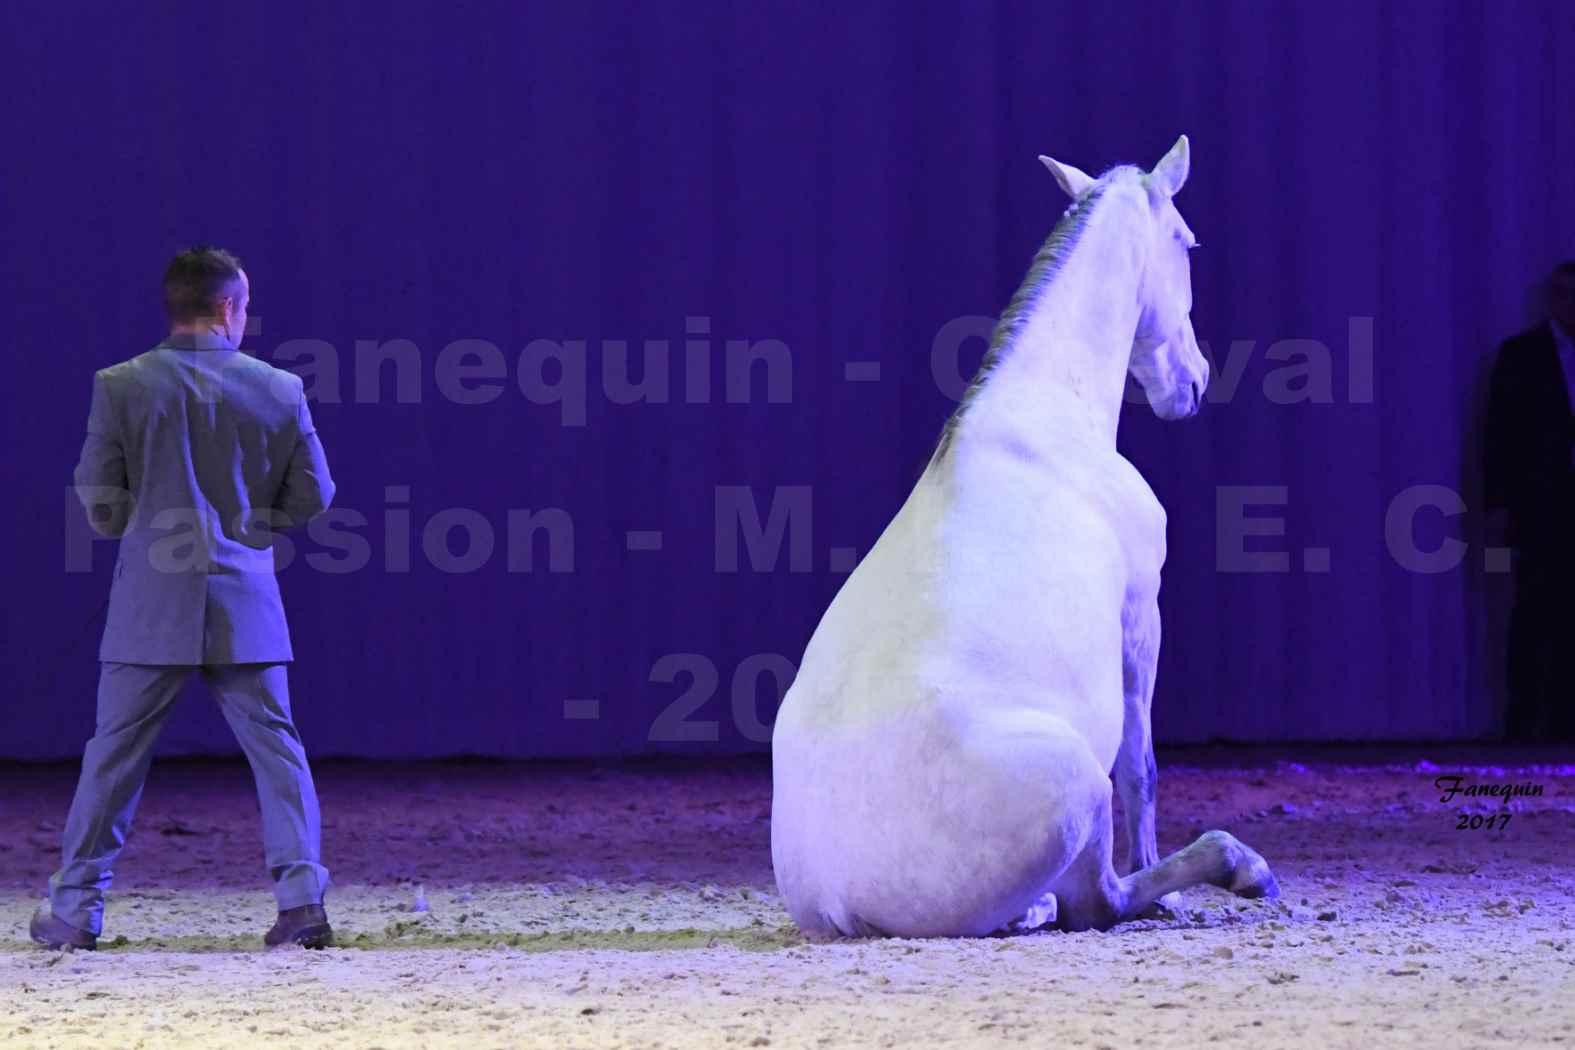 Cheval Passion 2017 - M. I. S. E. C. - Ludovic LONGO & 1 cheval en liberté - 16